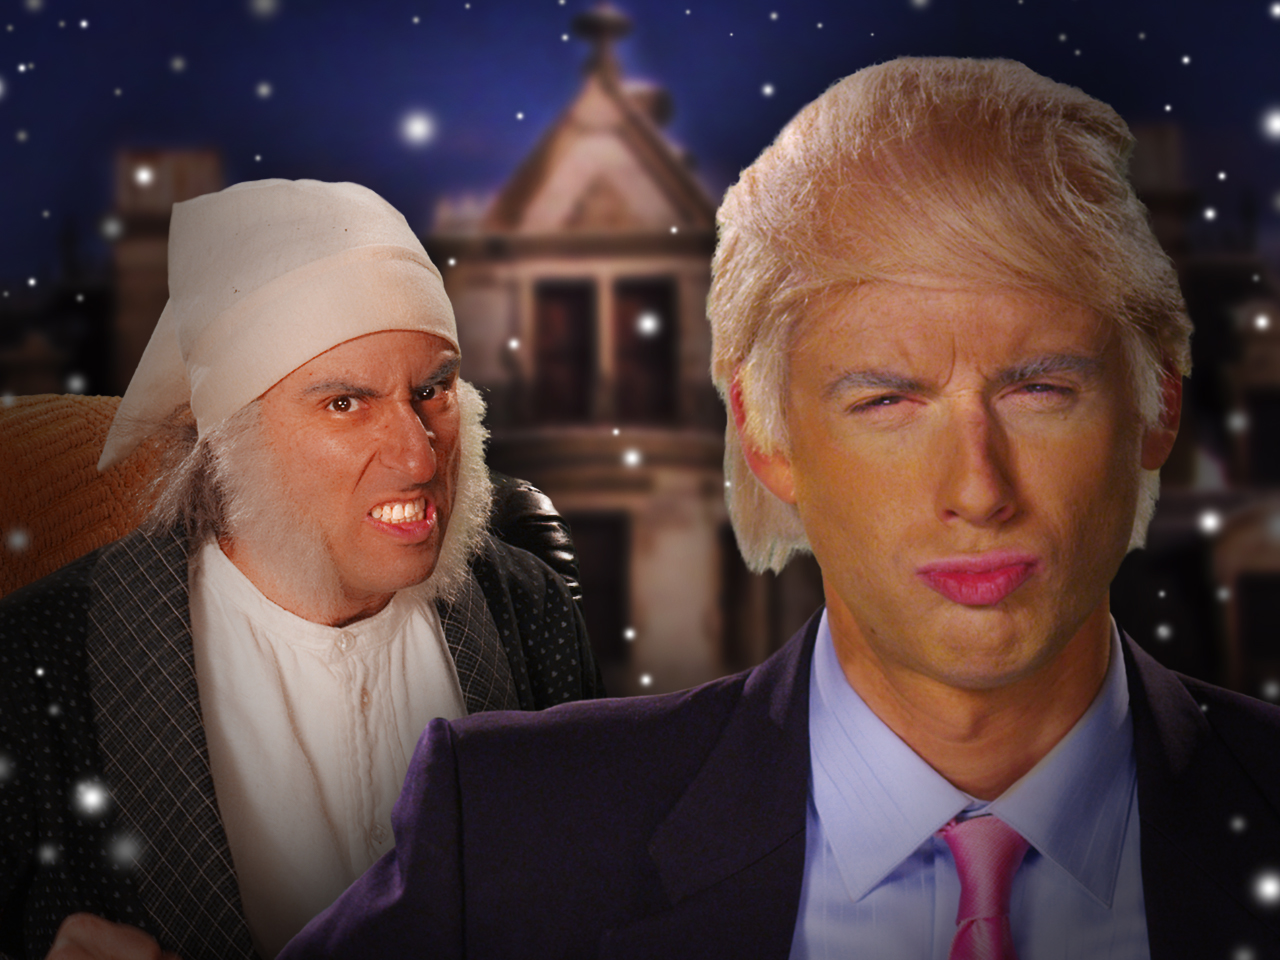 ERB - Donald Trump vs Ebenezer Scrooge thumbnail